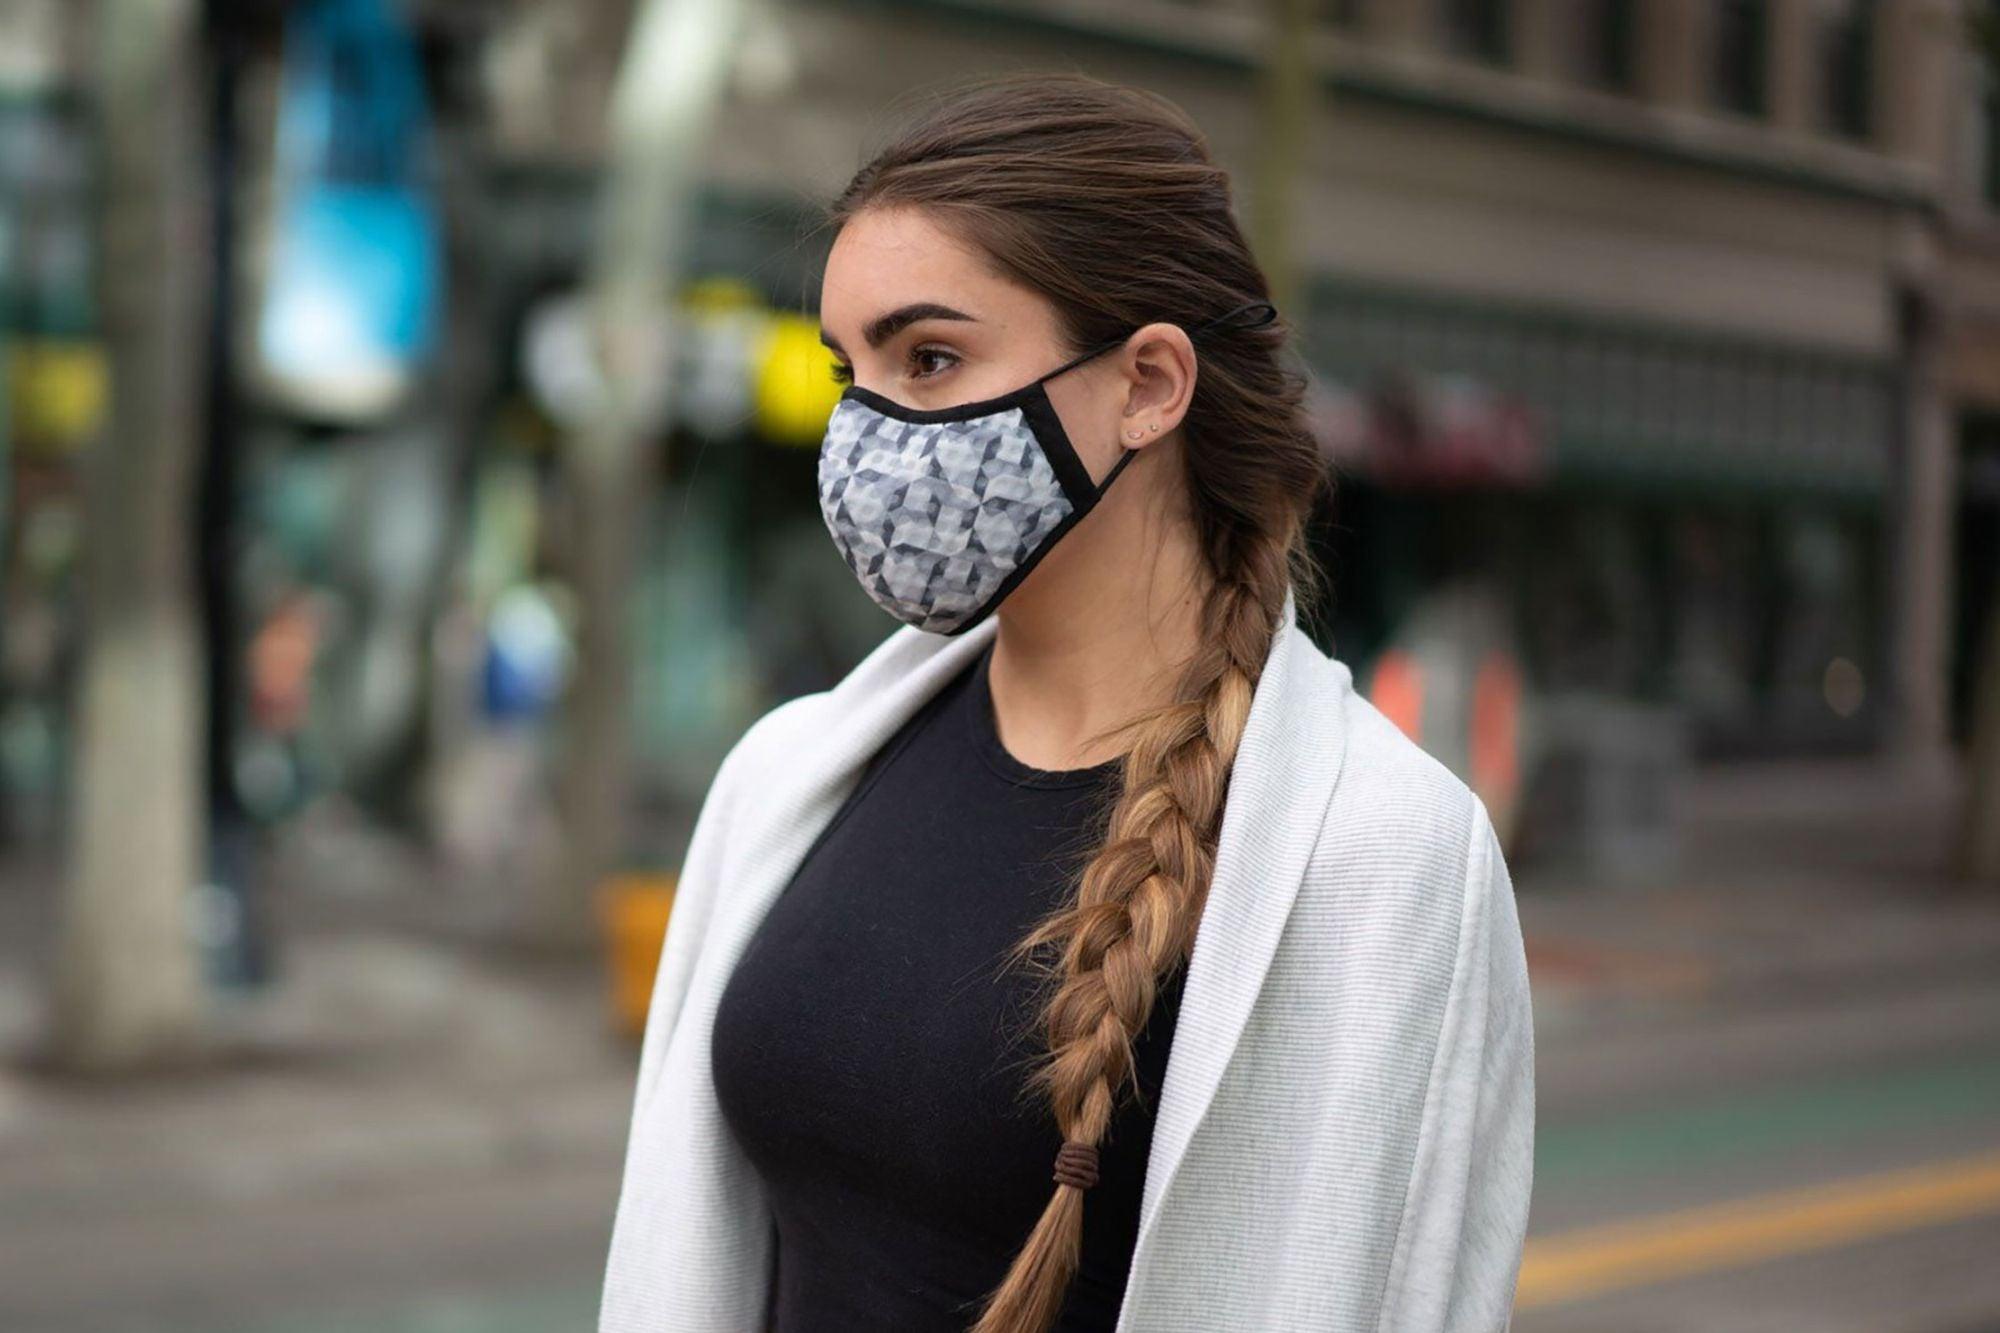 masque protection contre coronavirus